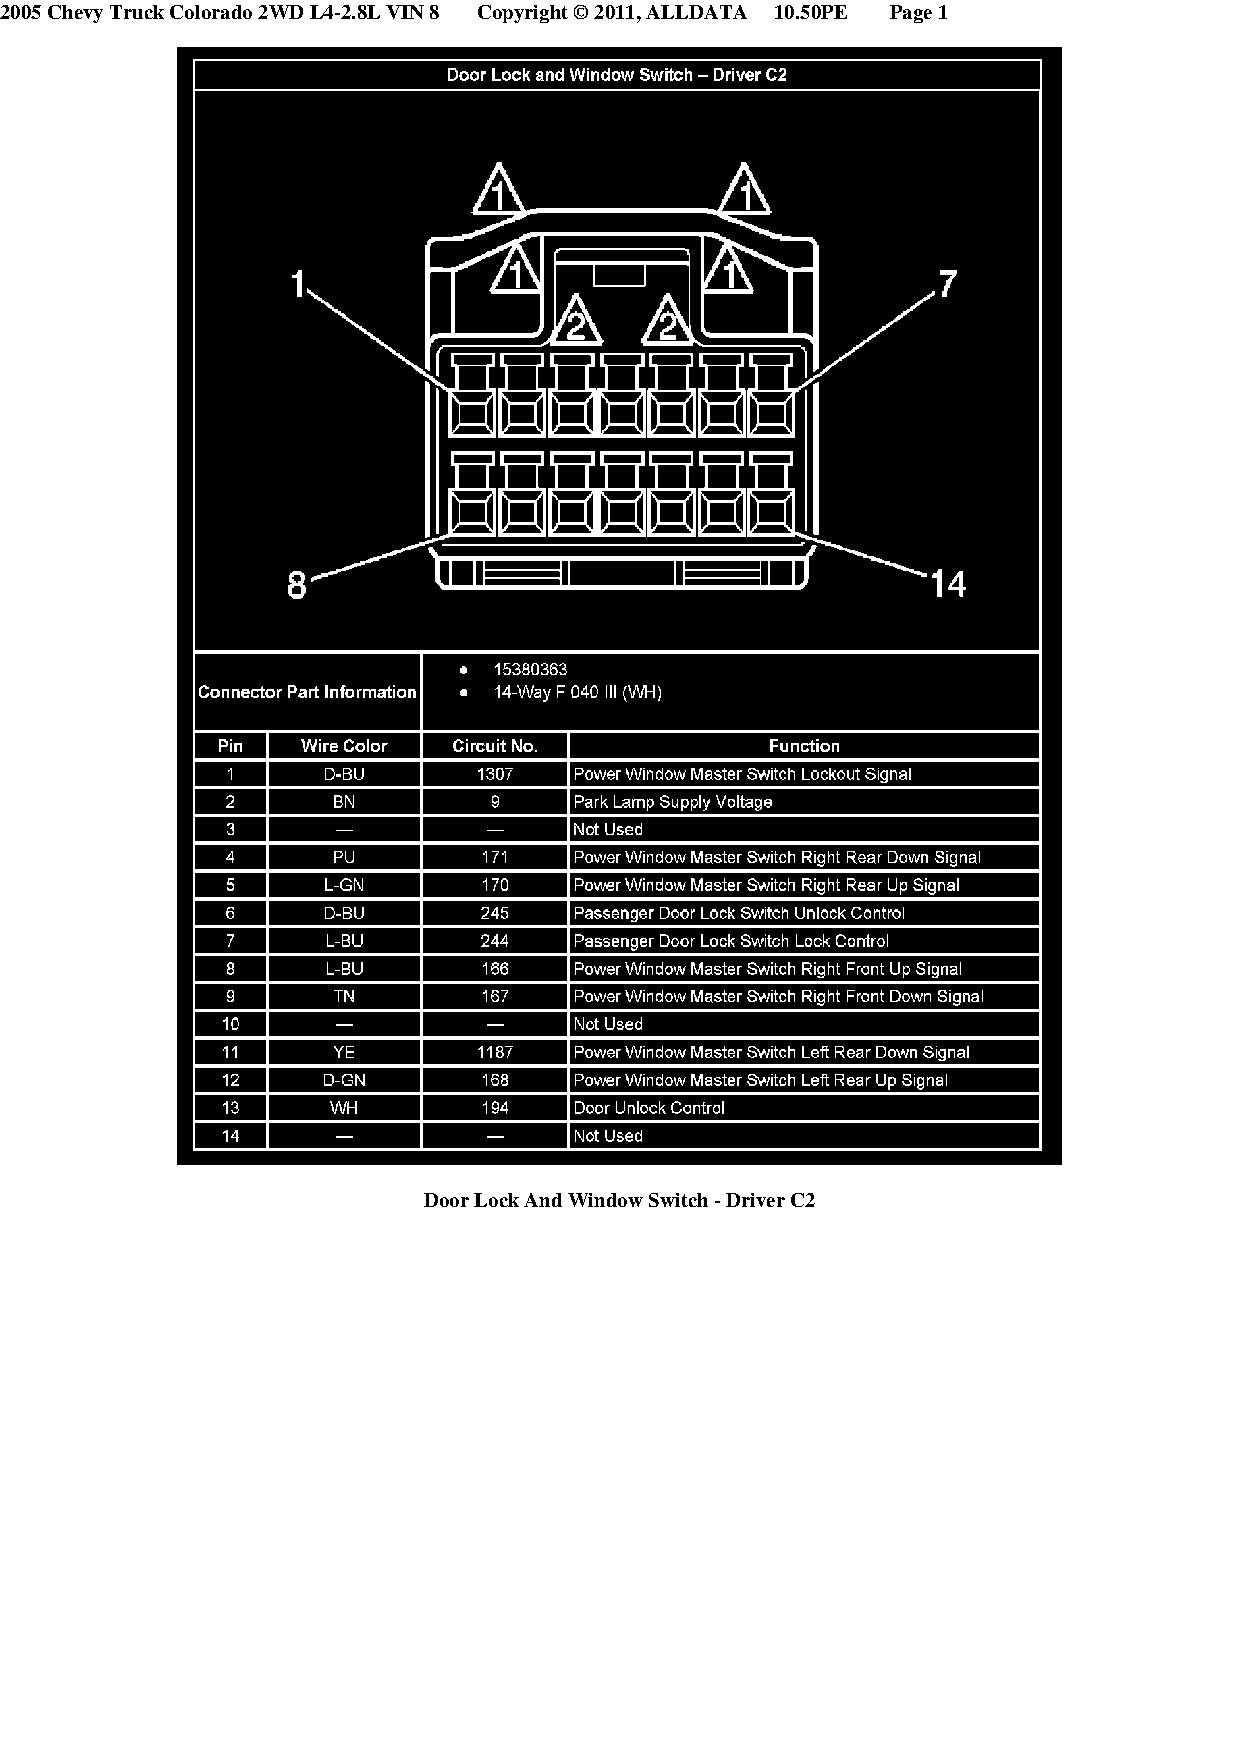 Colorado Window Switch Wiring Diagram - Wiring Diagram •